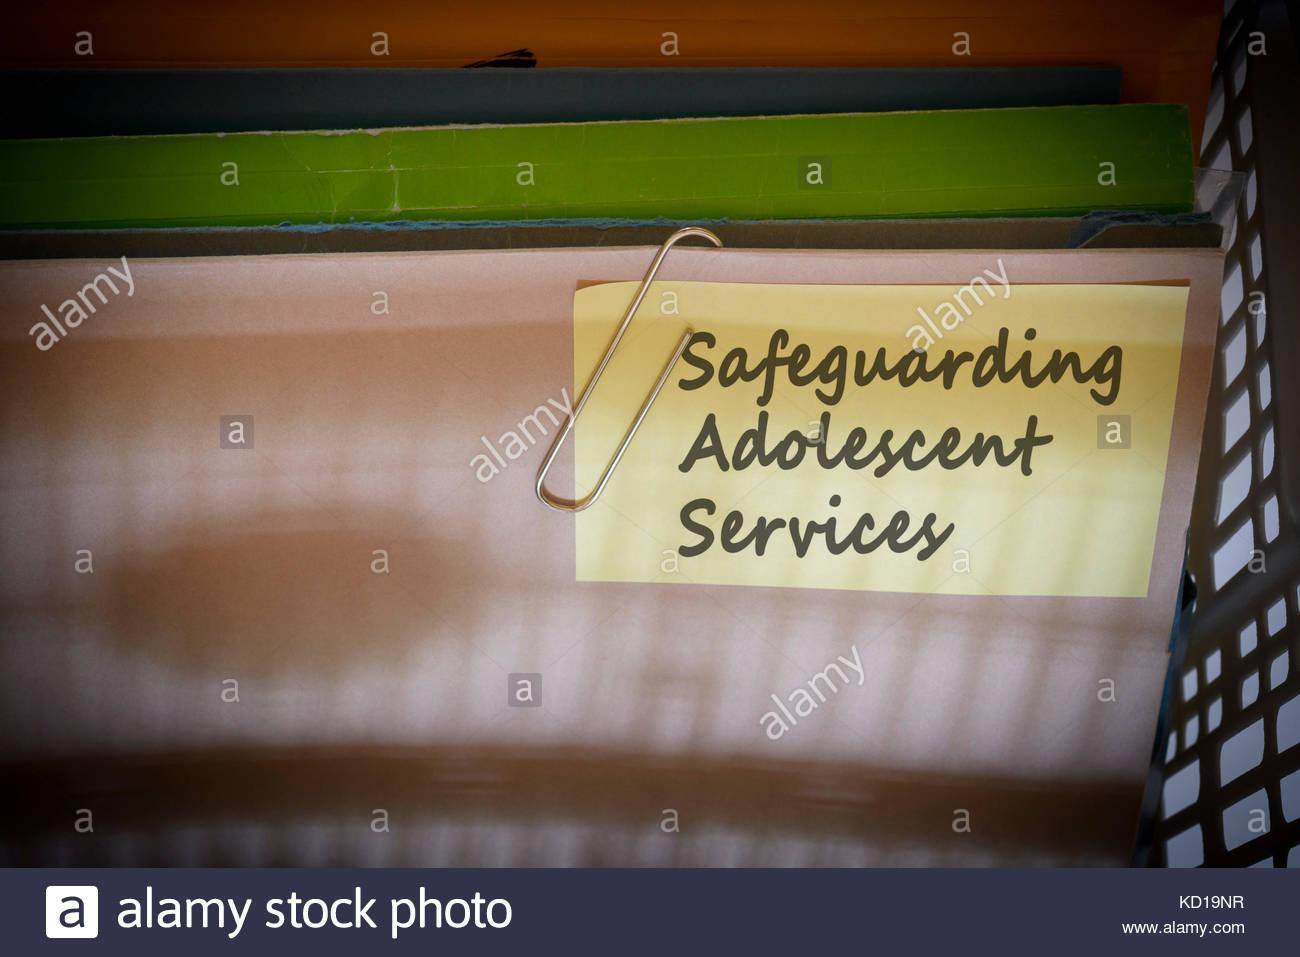 Safeguarding Adolescent Services written on document folder, Dorset, England. - Stock Image